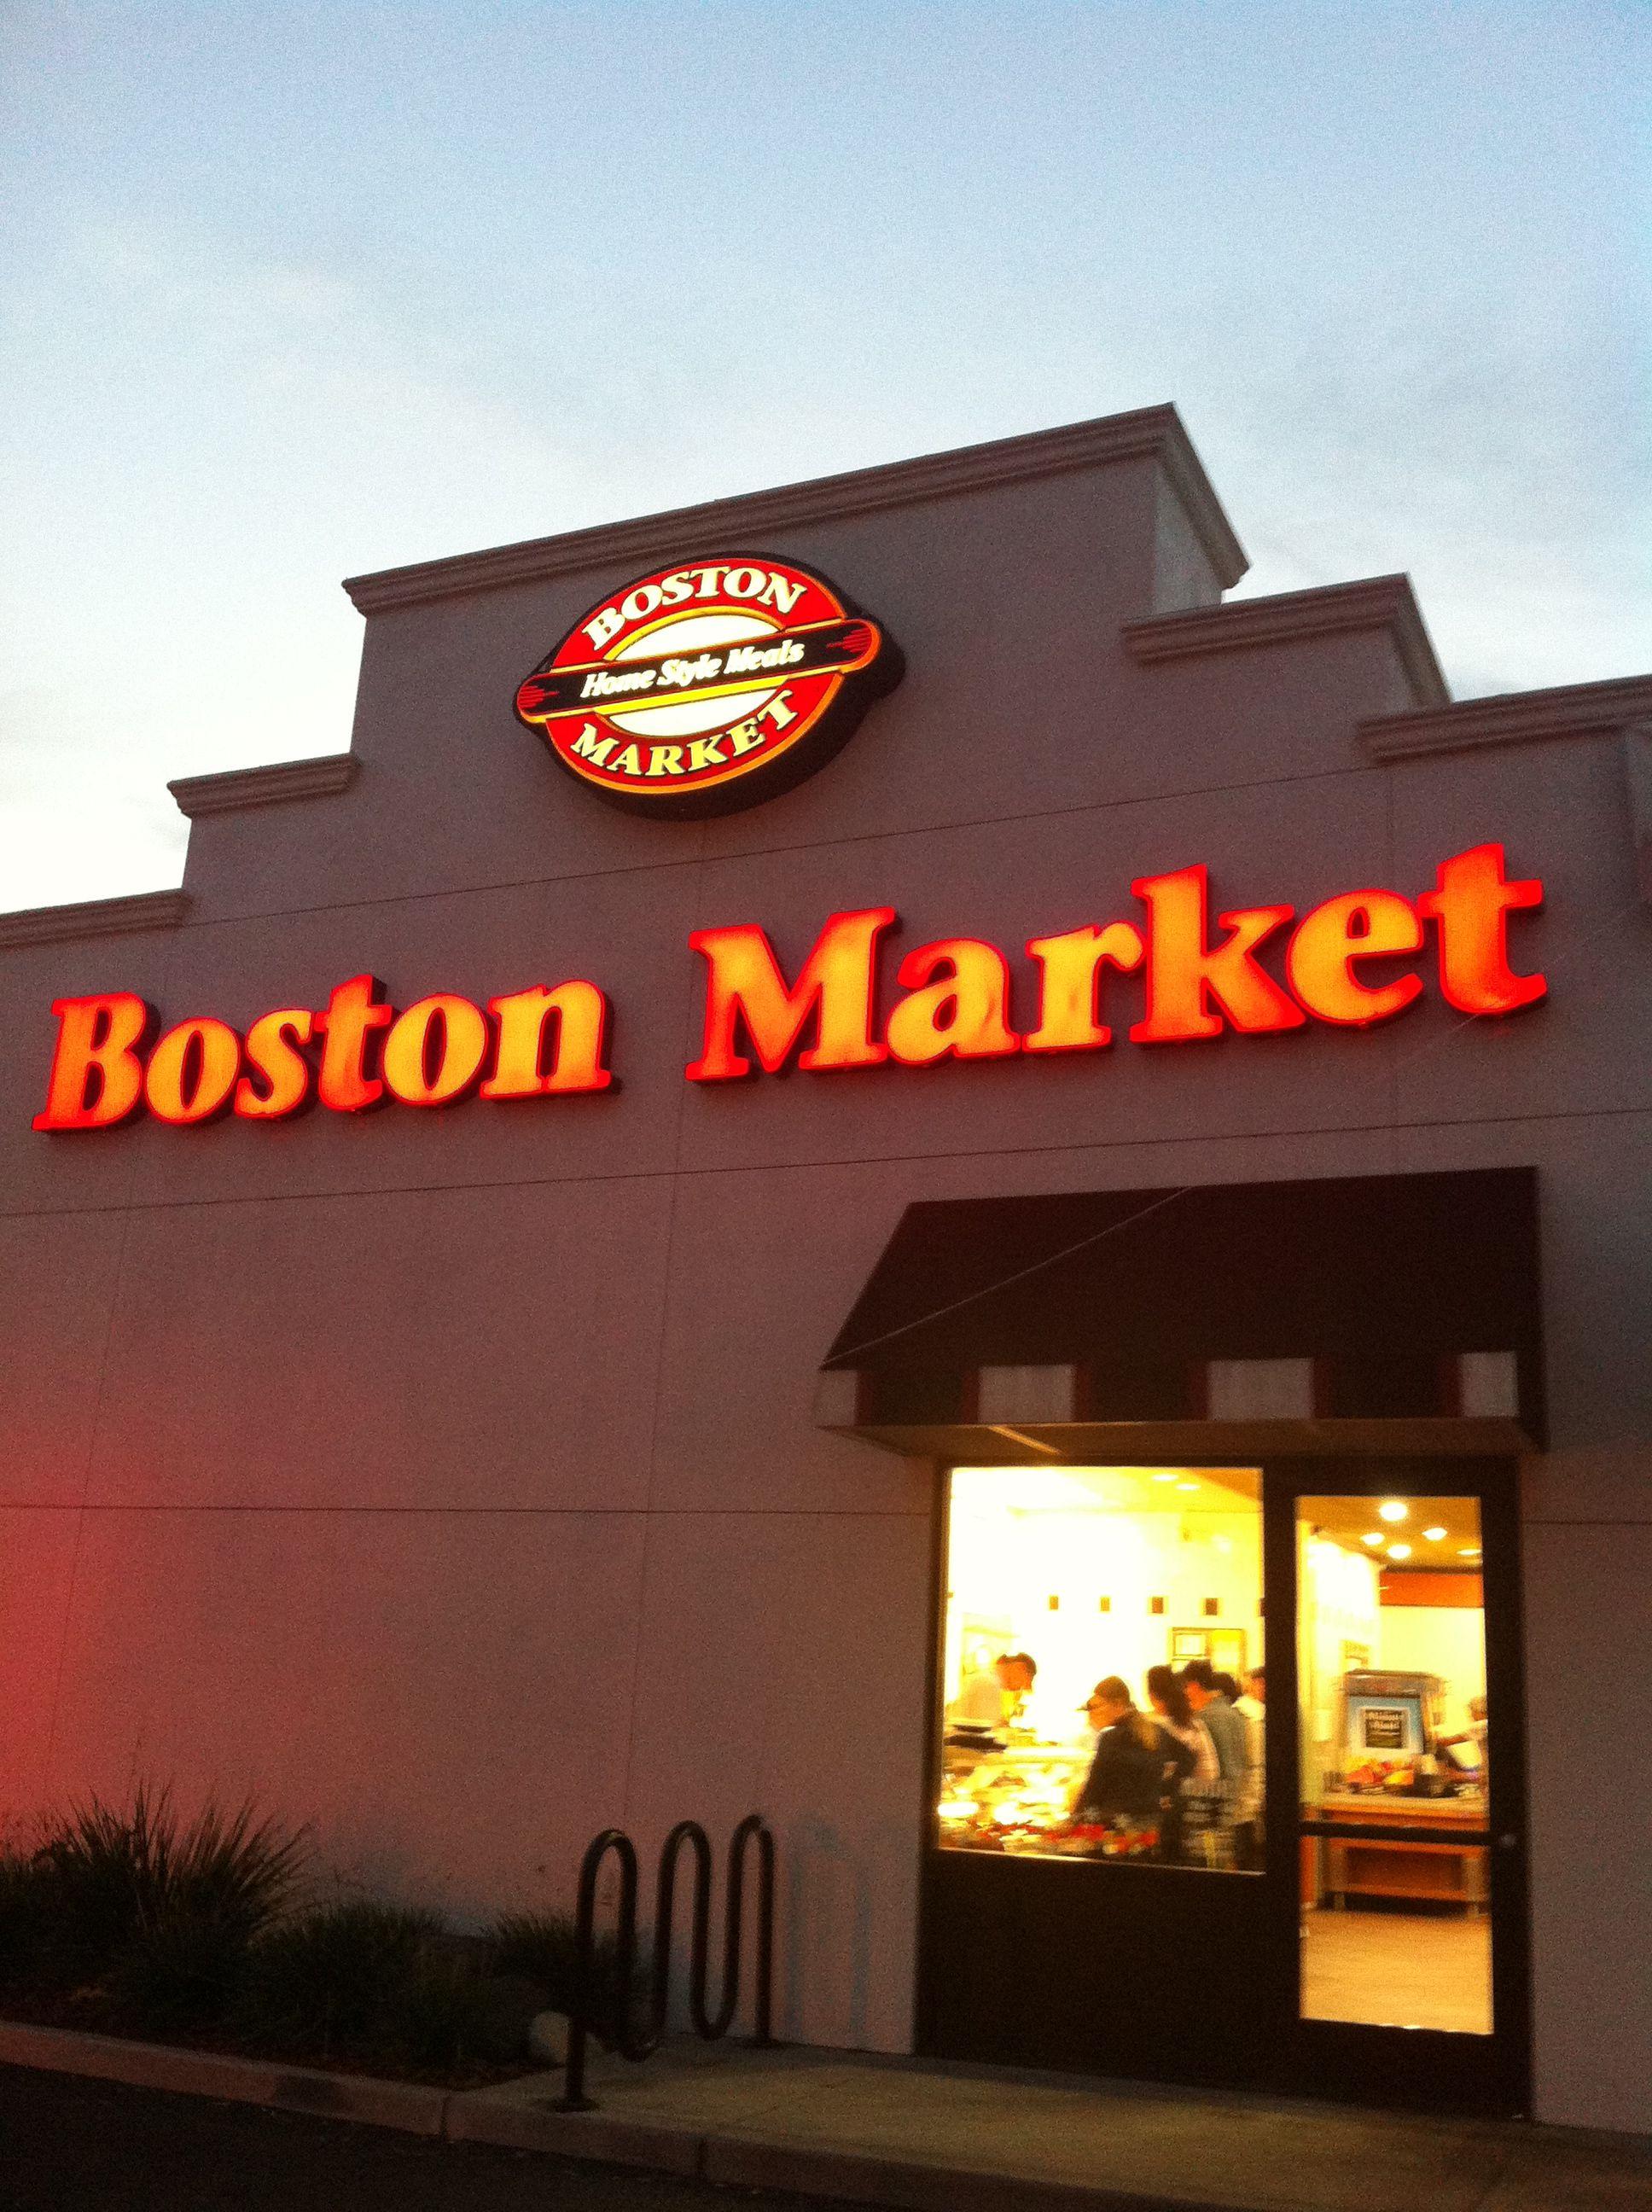 Boston Market Boston market, Broadway shows, Boston